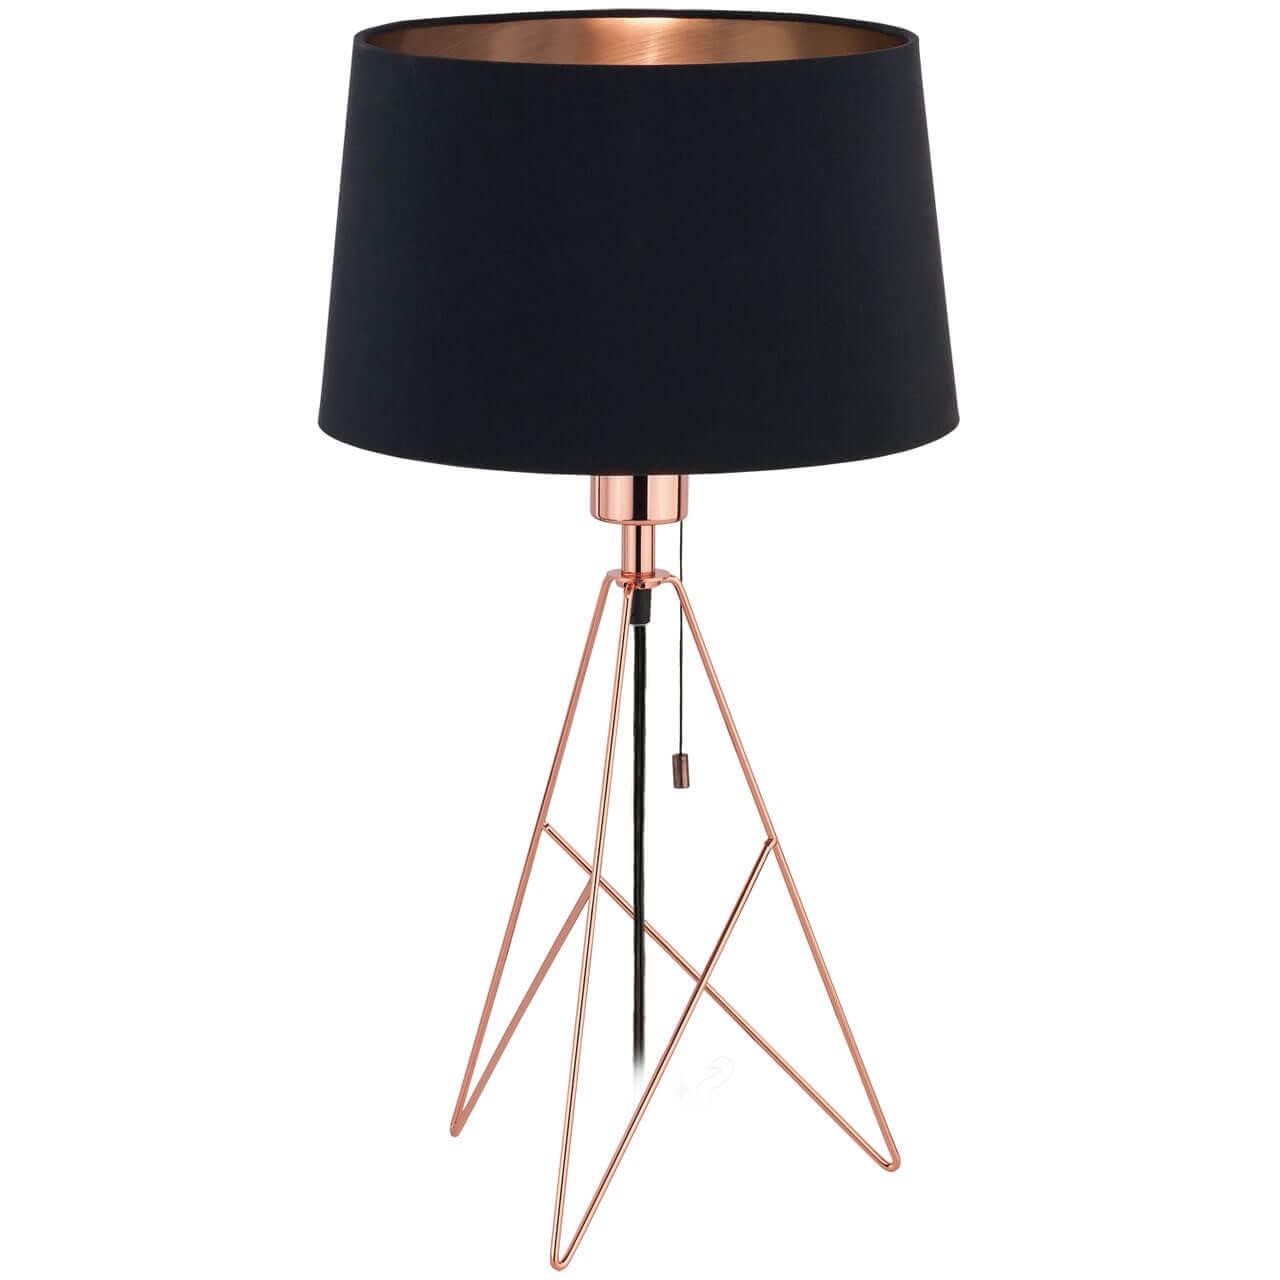 Настольная лампа Eglo Camporale 39178 цена и фото